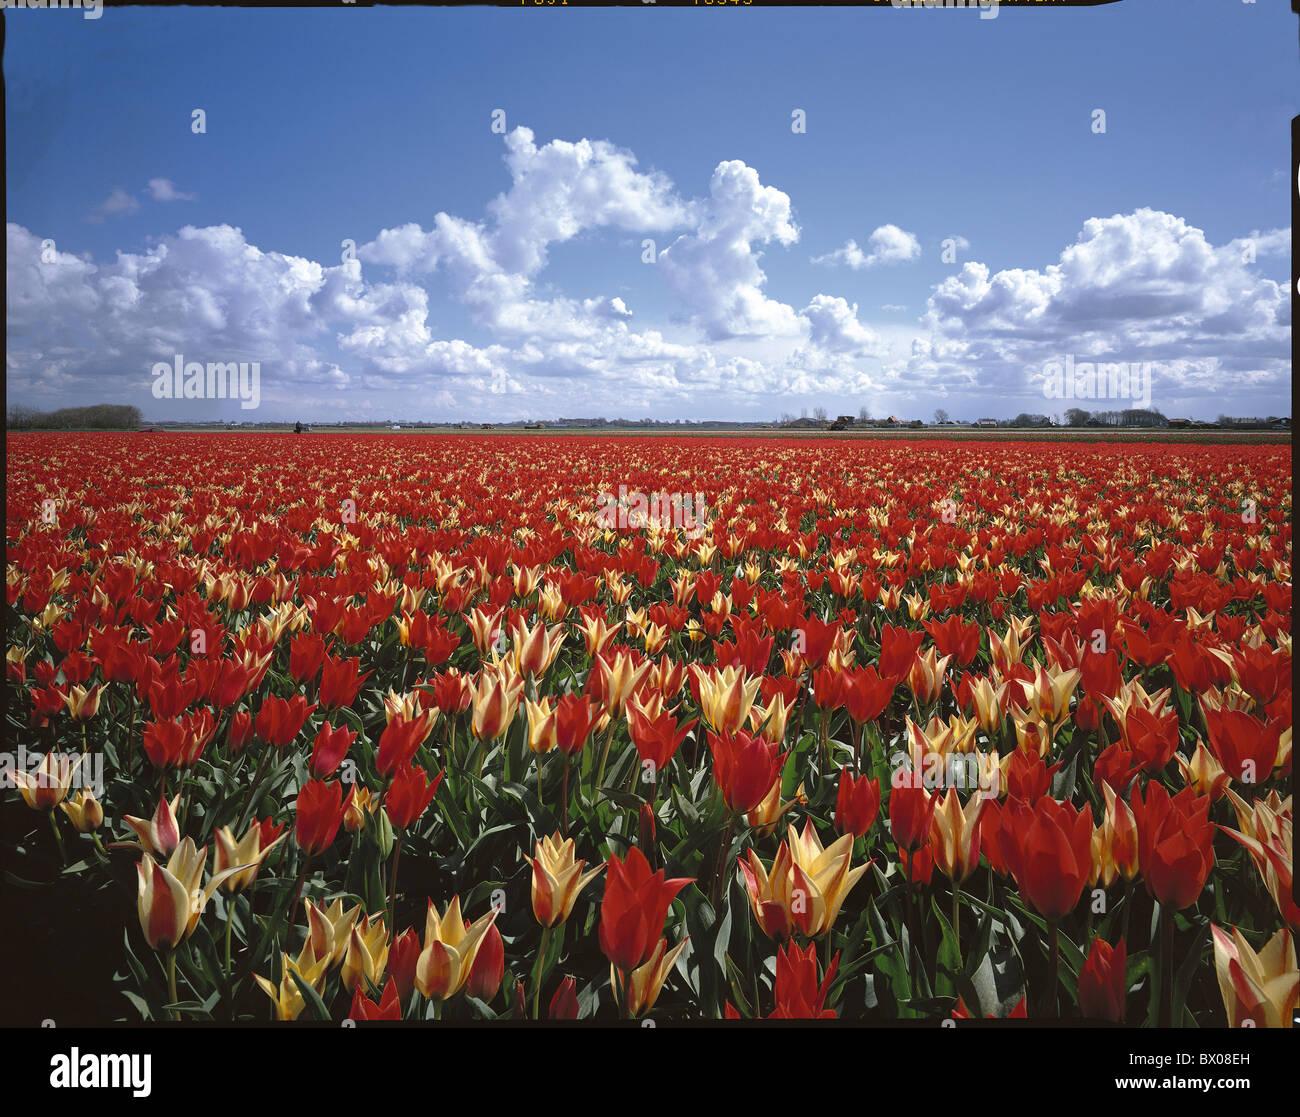 Blumen Blume Feld Egmond im Bereich Holland Landschaft Landwirtschaft Niederlande Tulpen Tulpen Feld Wolke Stockbild